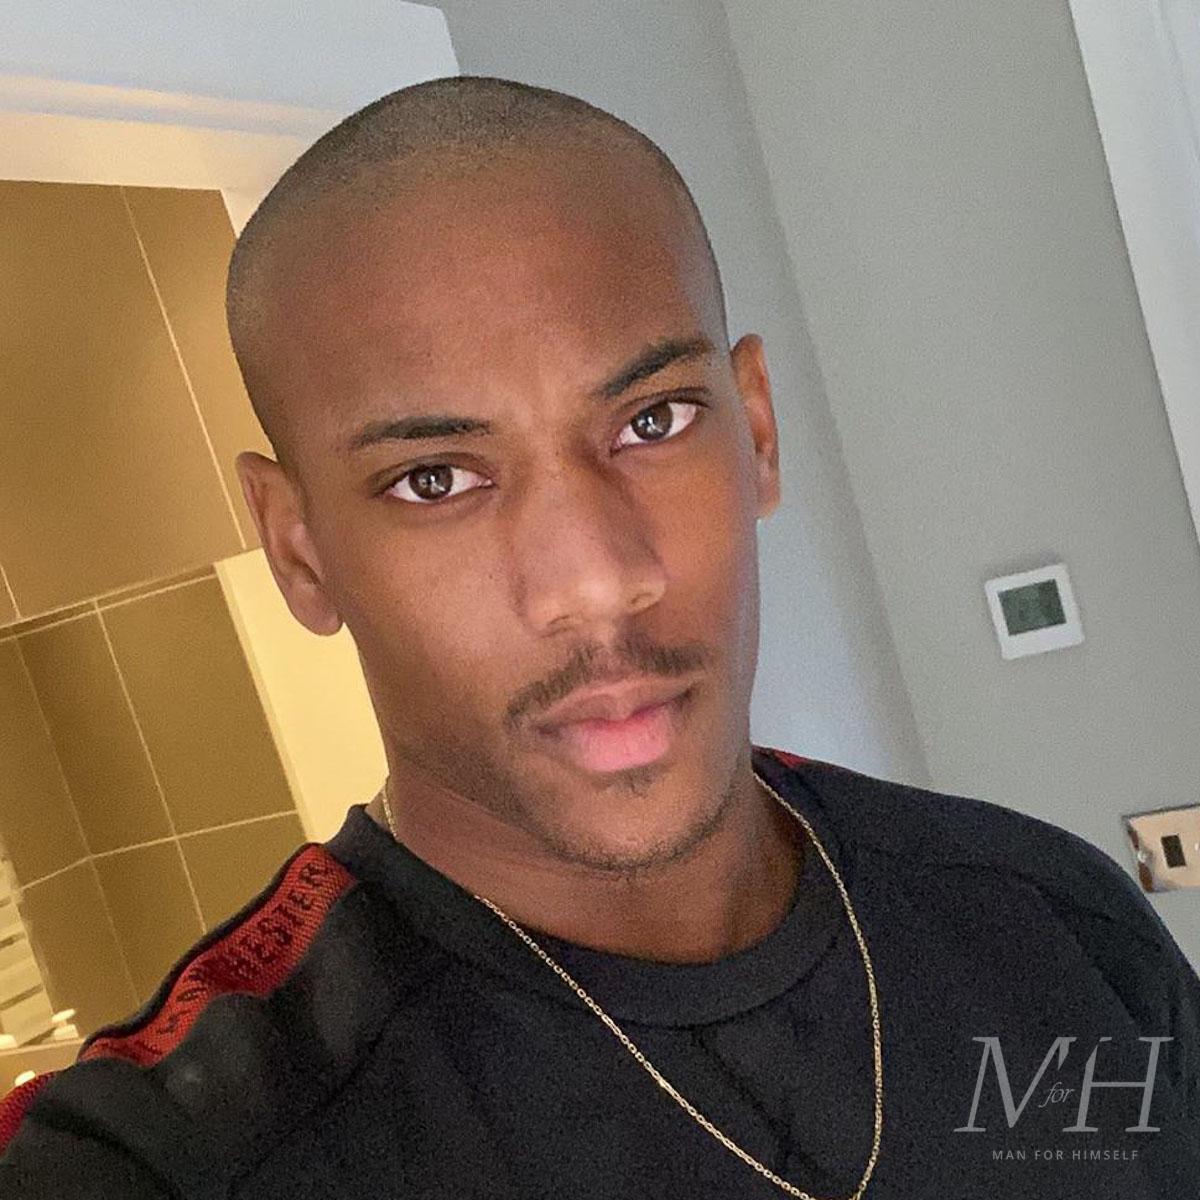 anthony-martial-footballer-hair-shaved-head-lockdown-man-for-himself-1